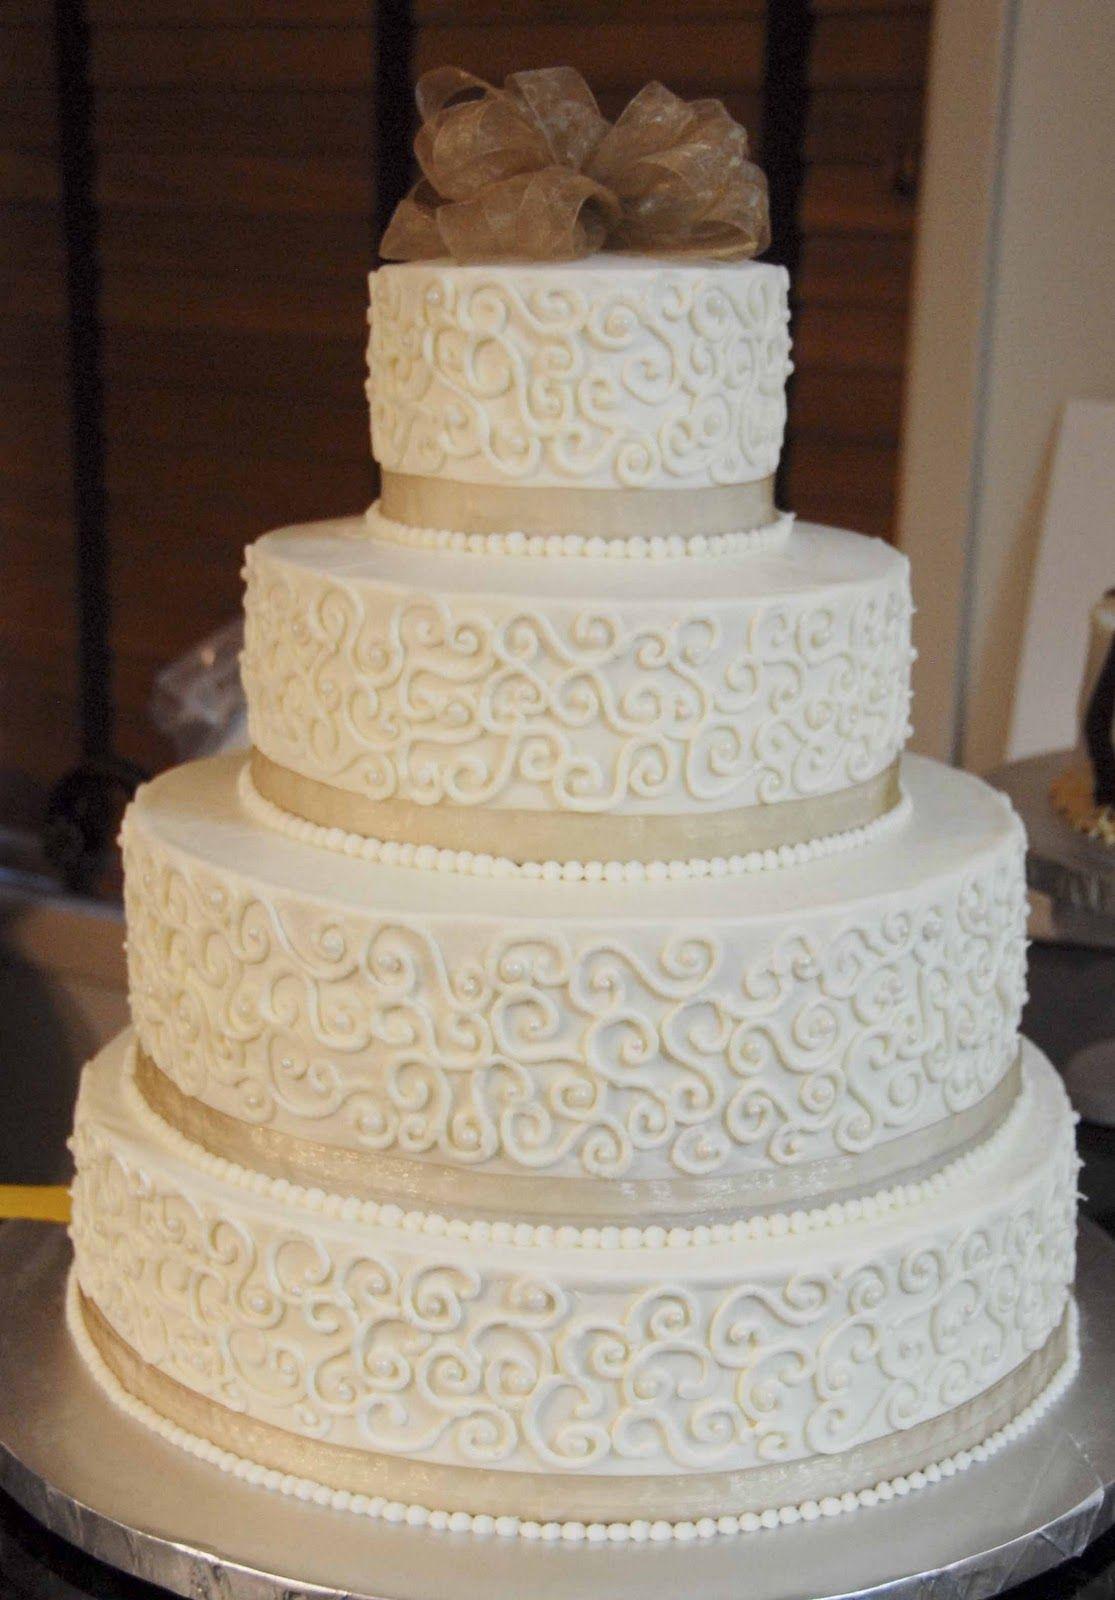 50th wedding anniversary cakes | wedding cakes, 1 50th wedding ...